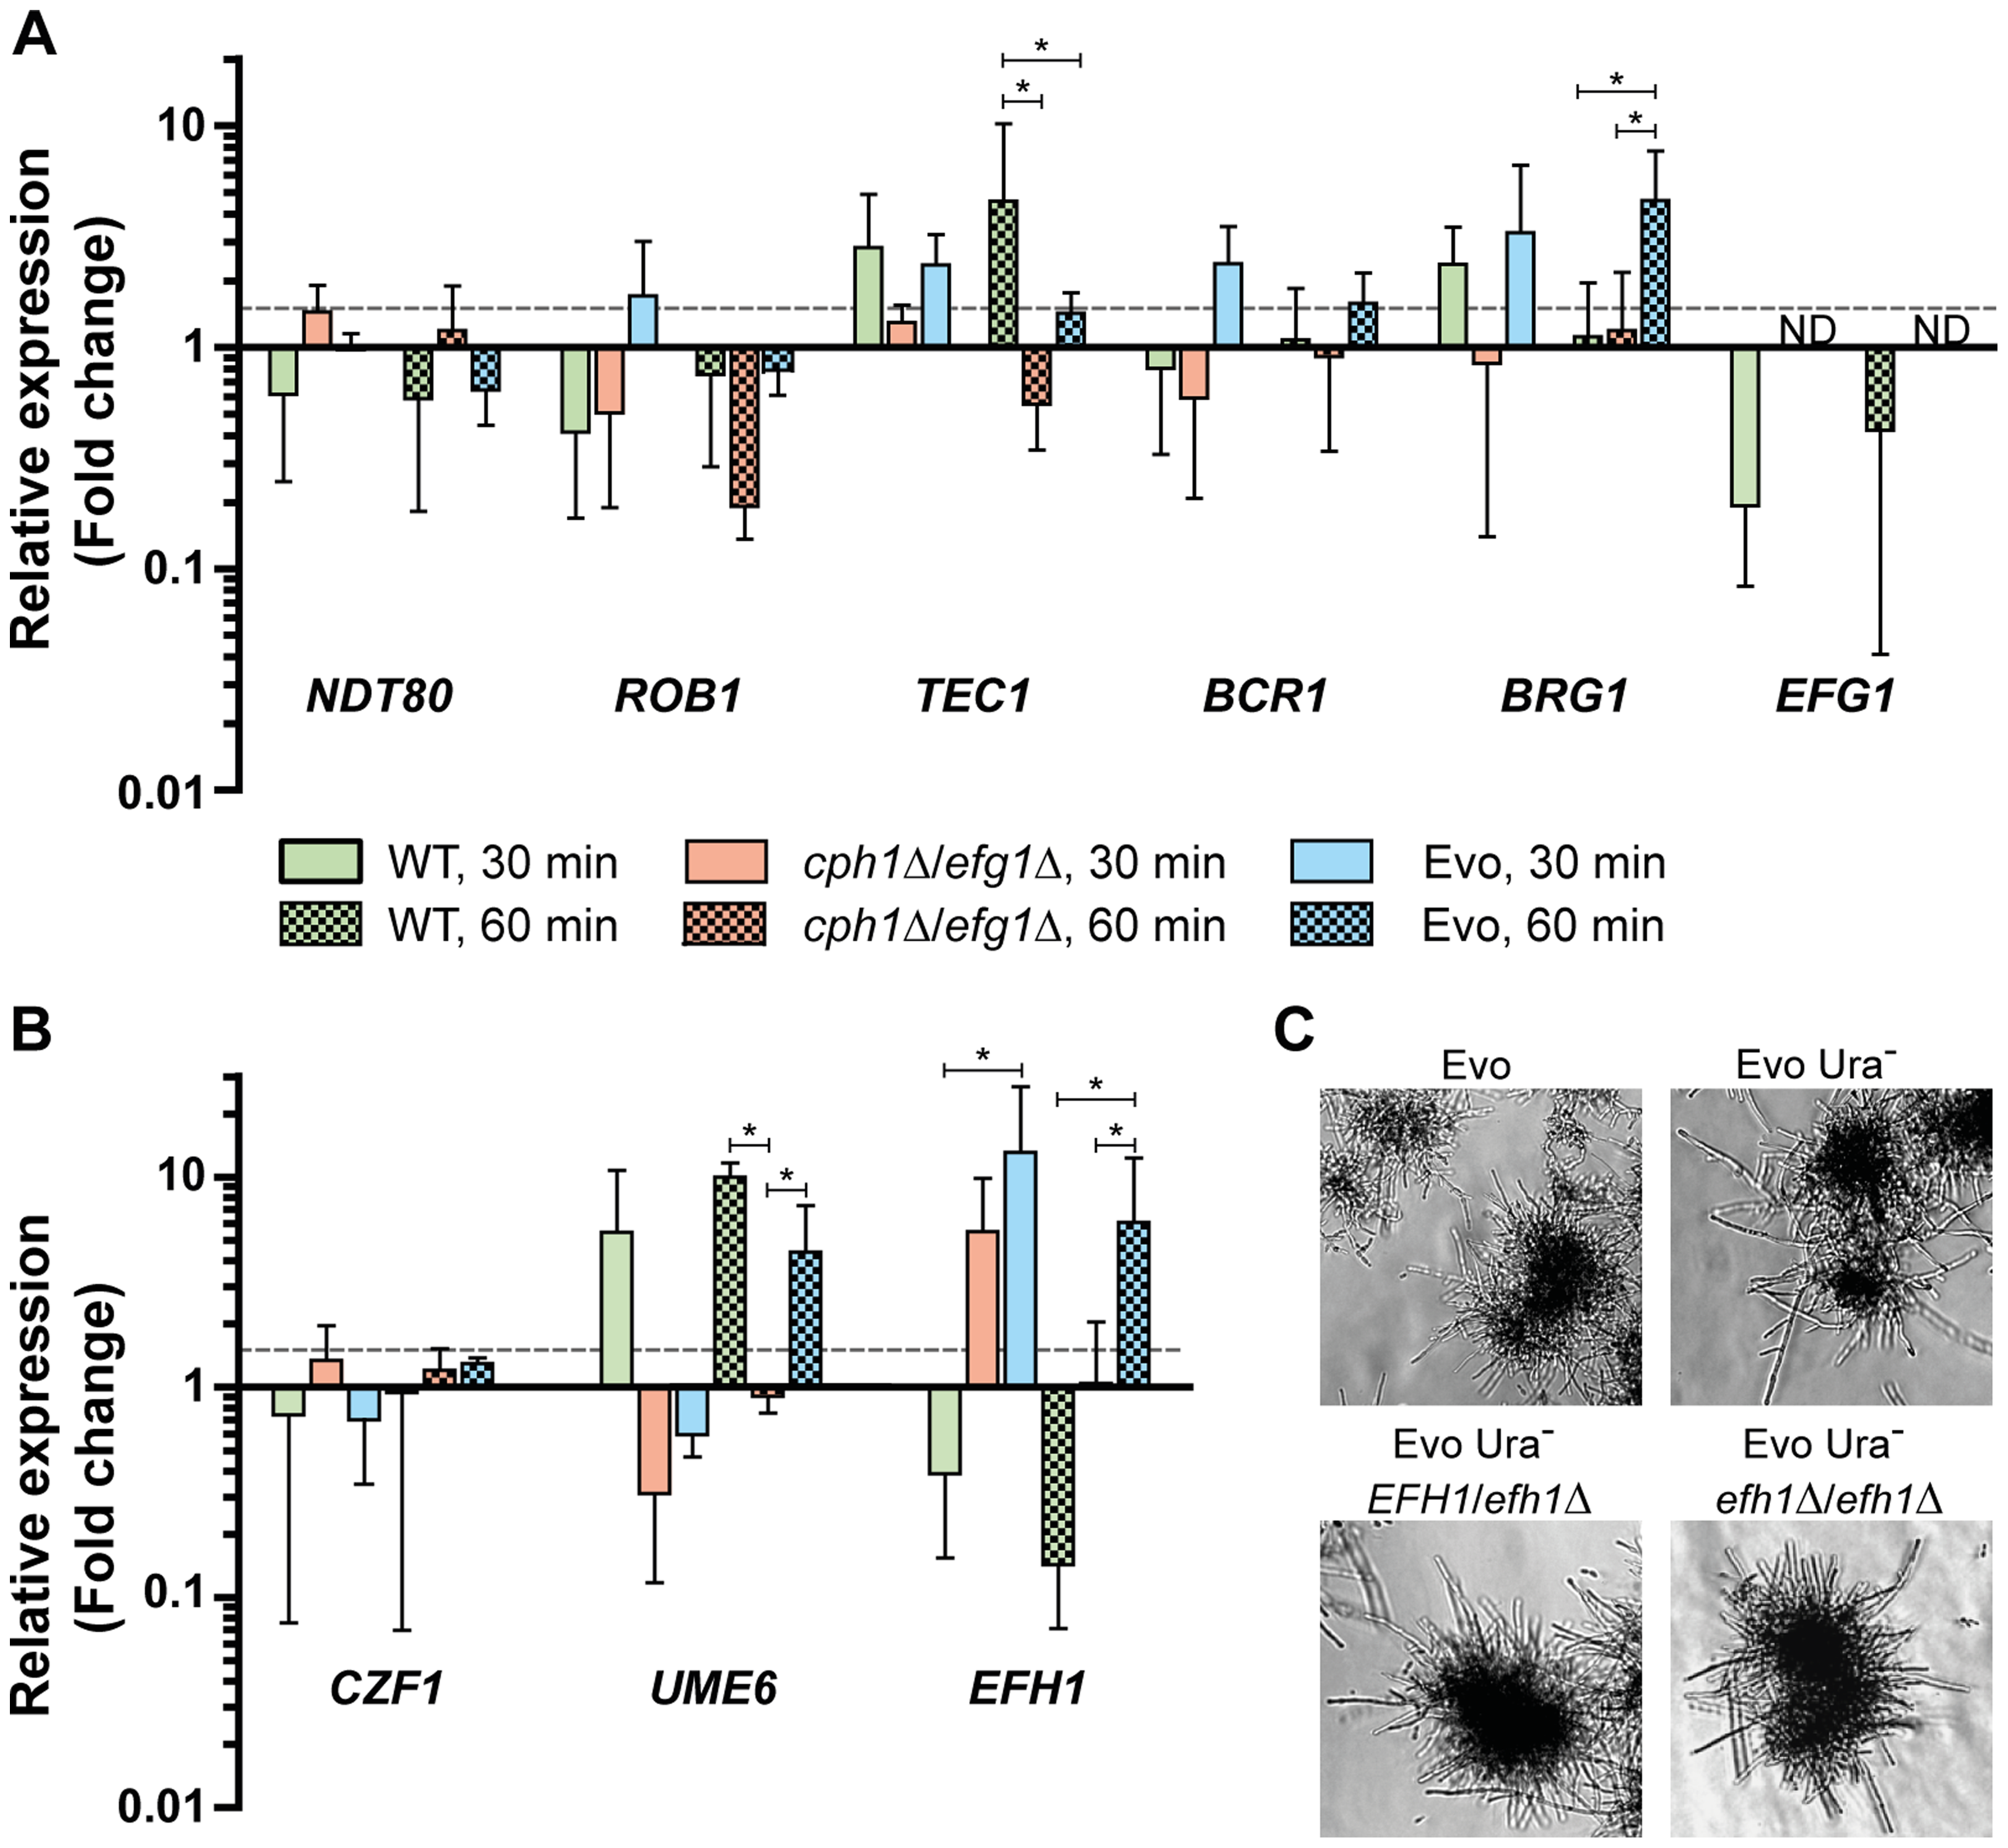 Expression of transcription factors under filament-inducing conditions.